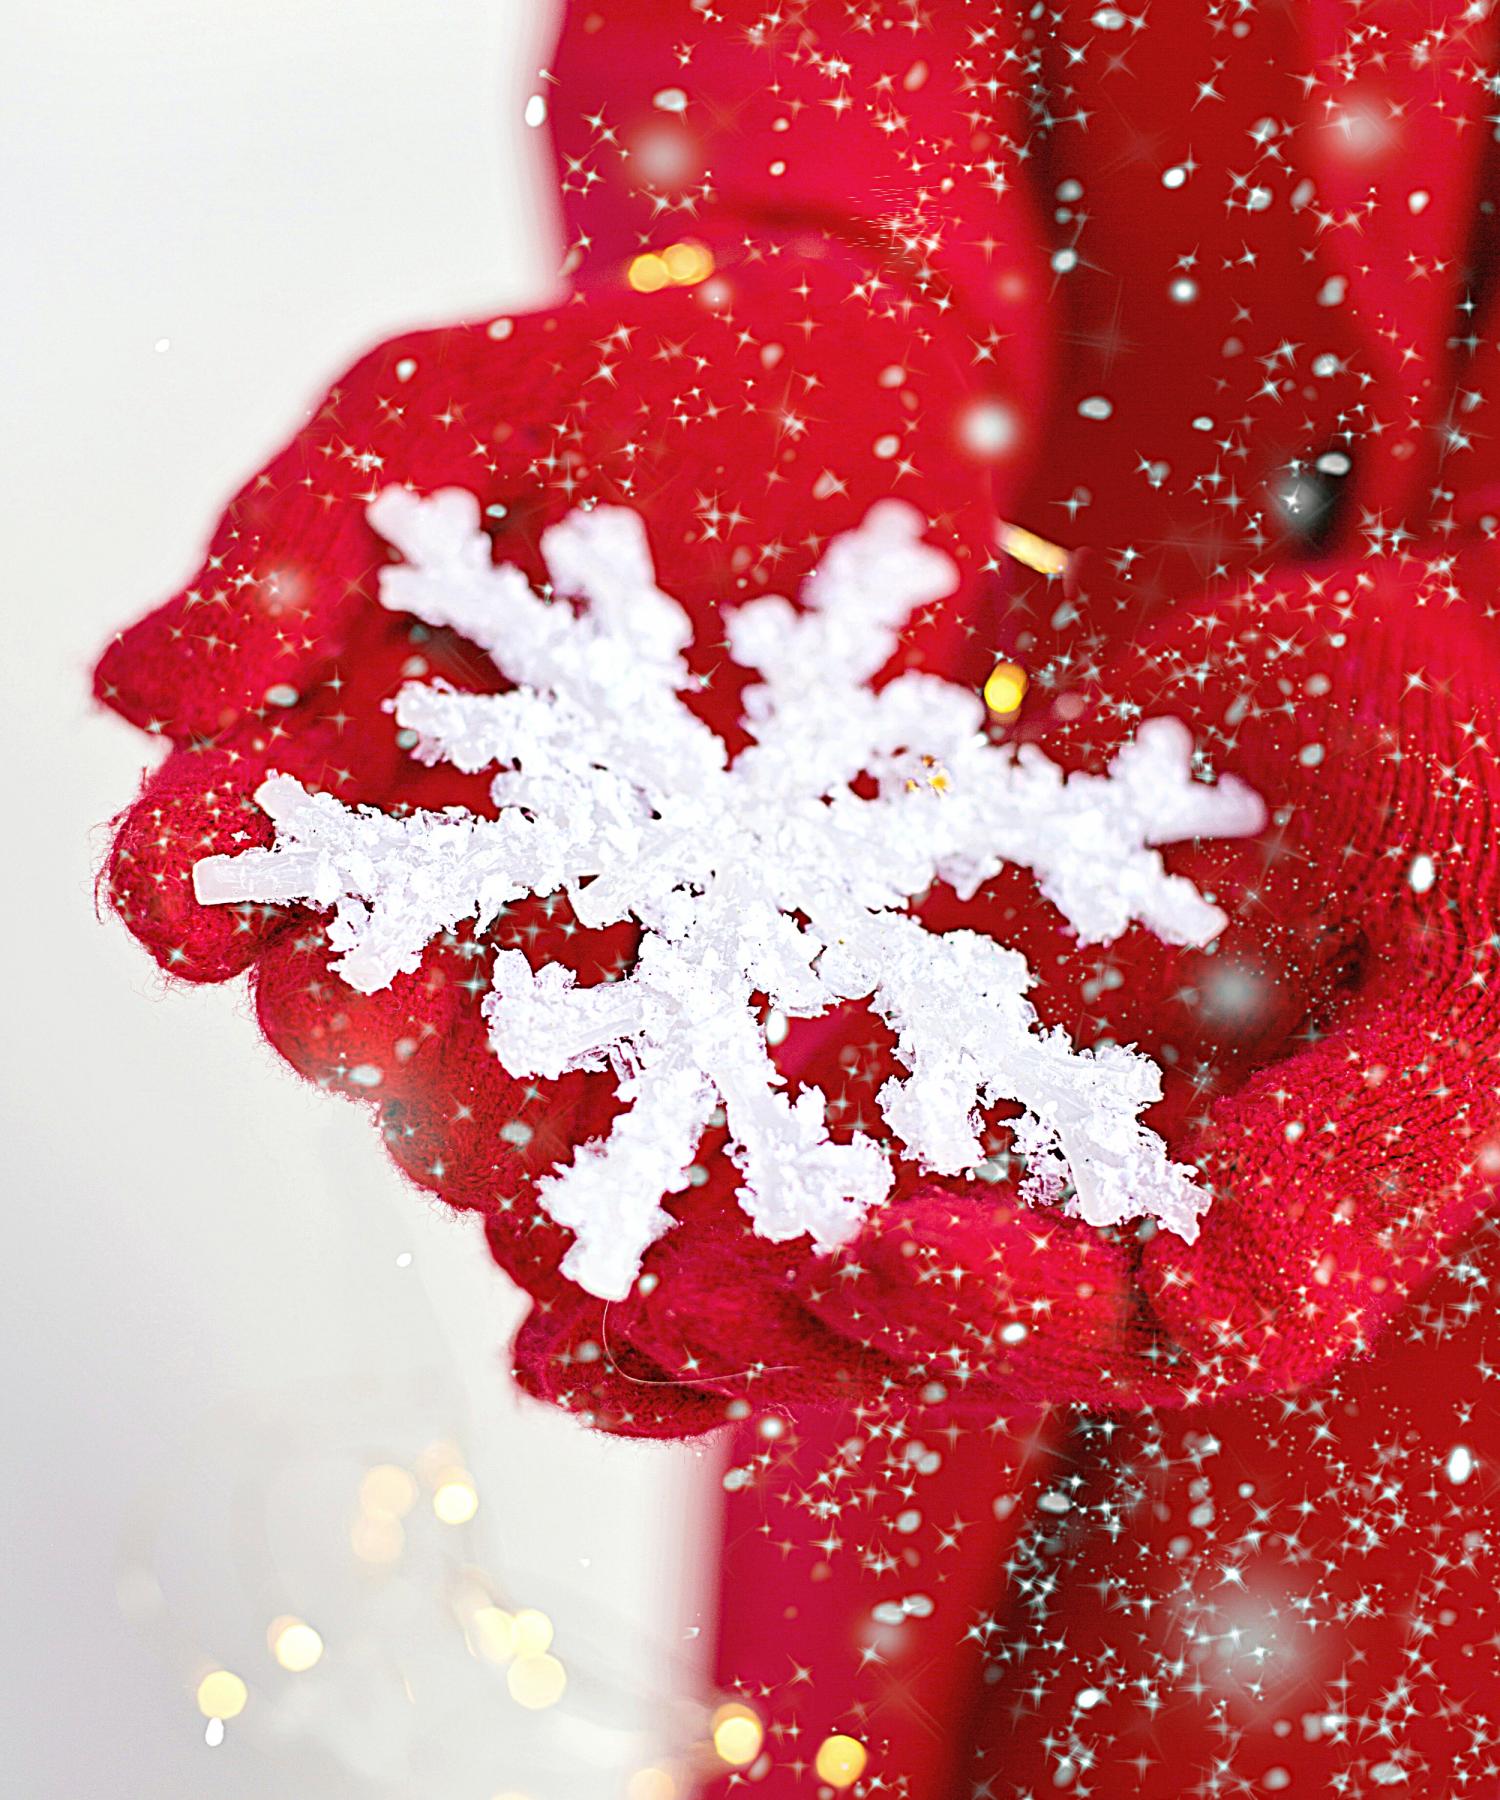 Winter_2021_snowflake red glove